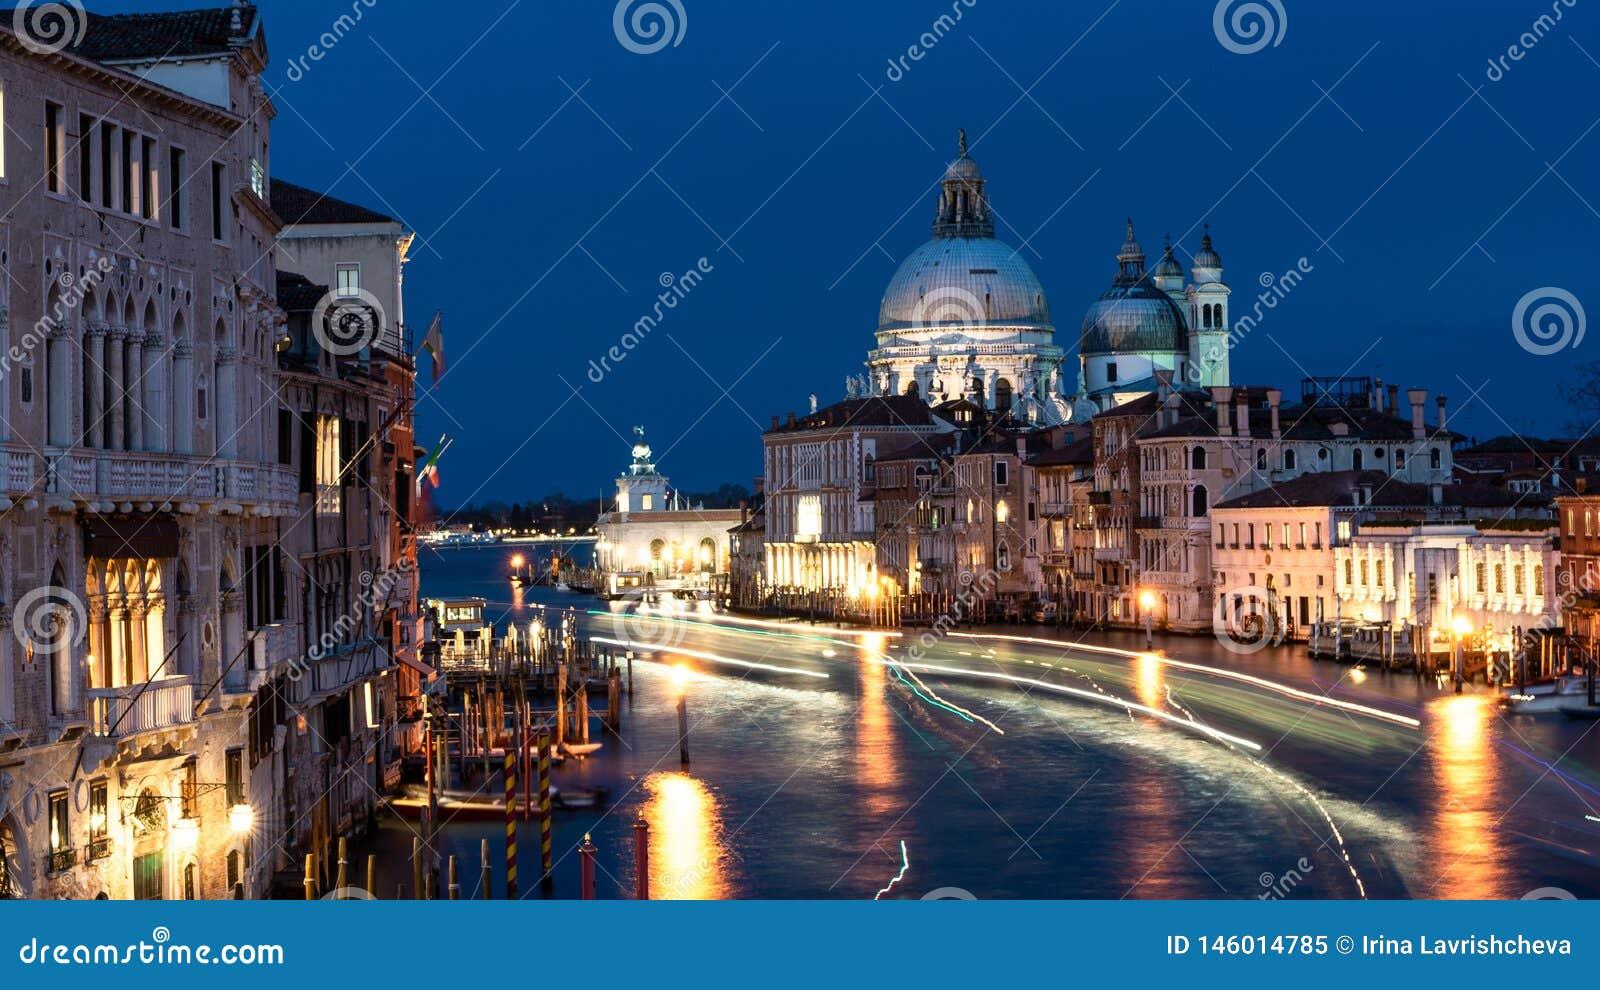 Beautiful view on Basilica di Santa Maria della Salute in golden evening light at sunset in Venice, Italy